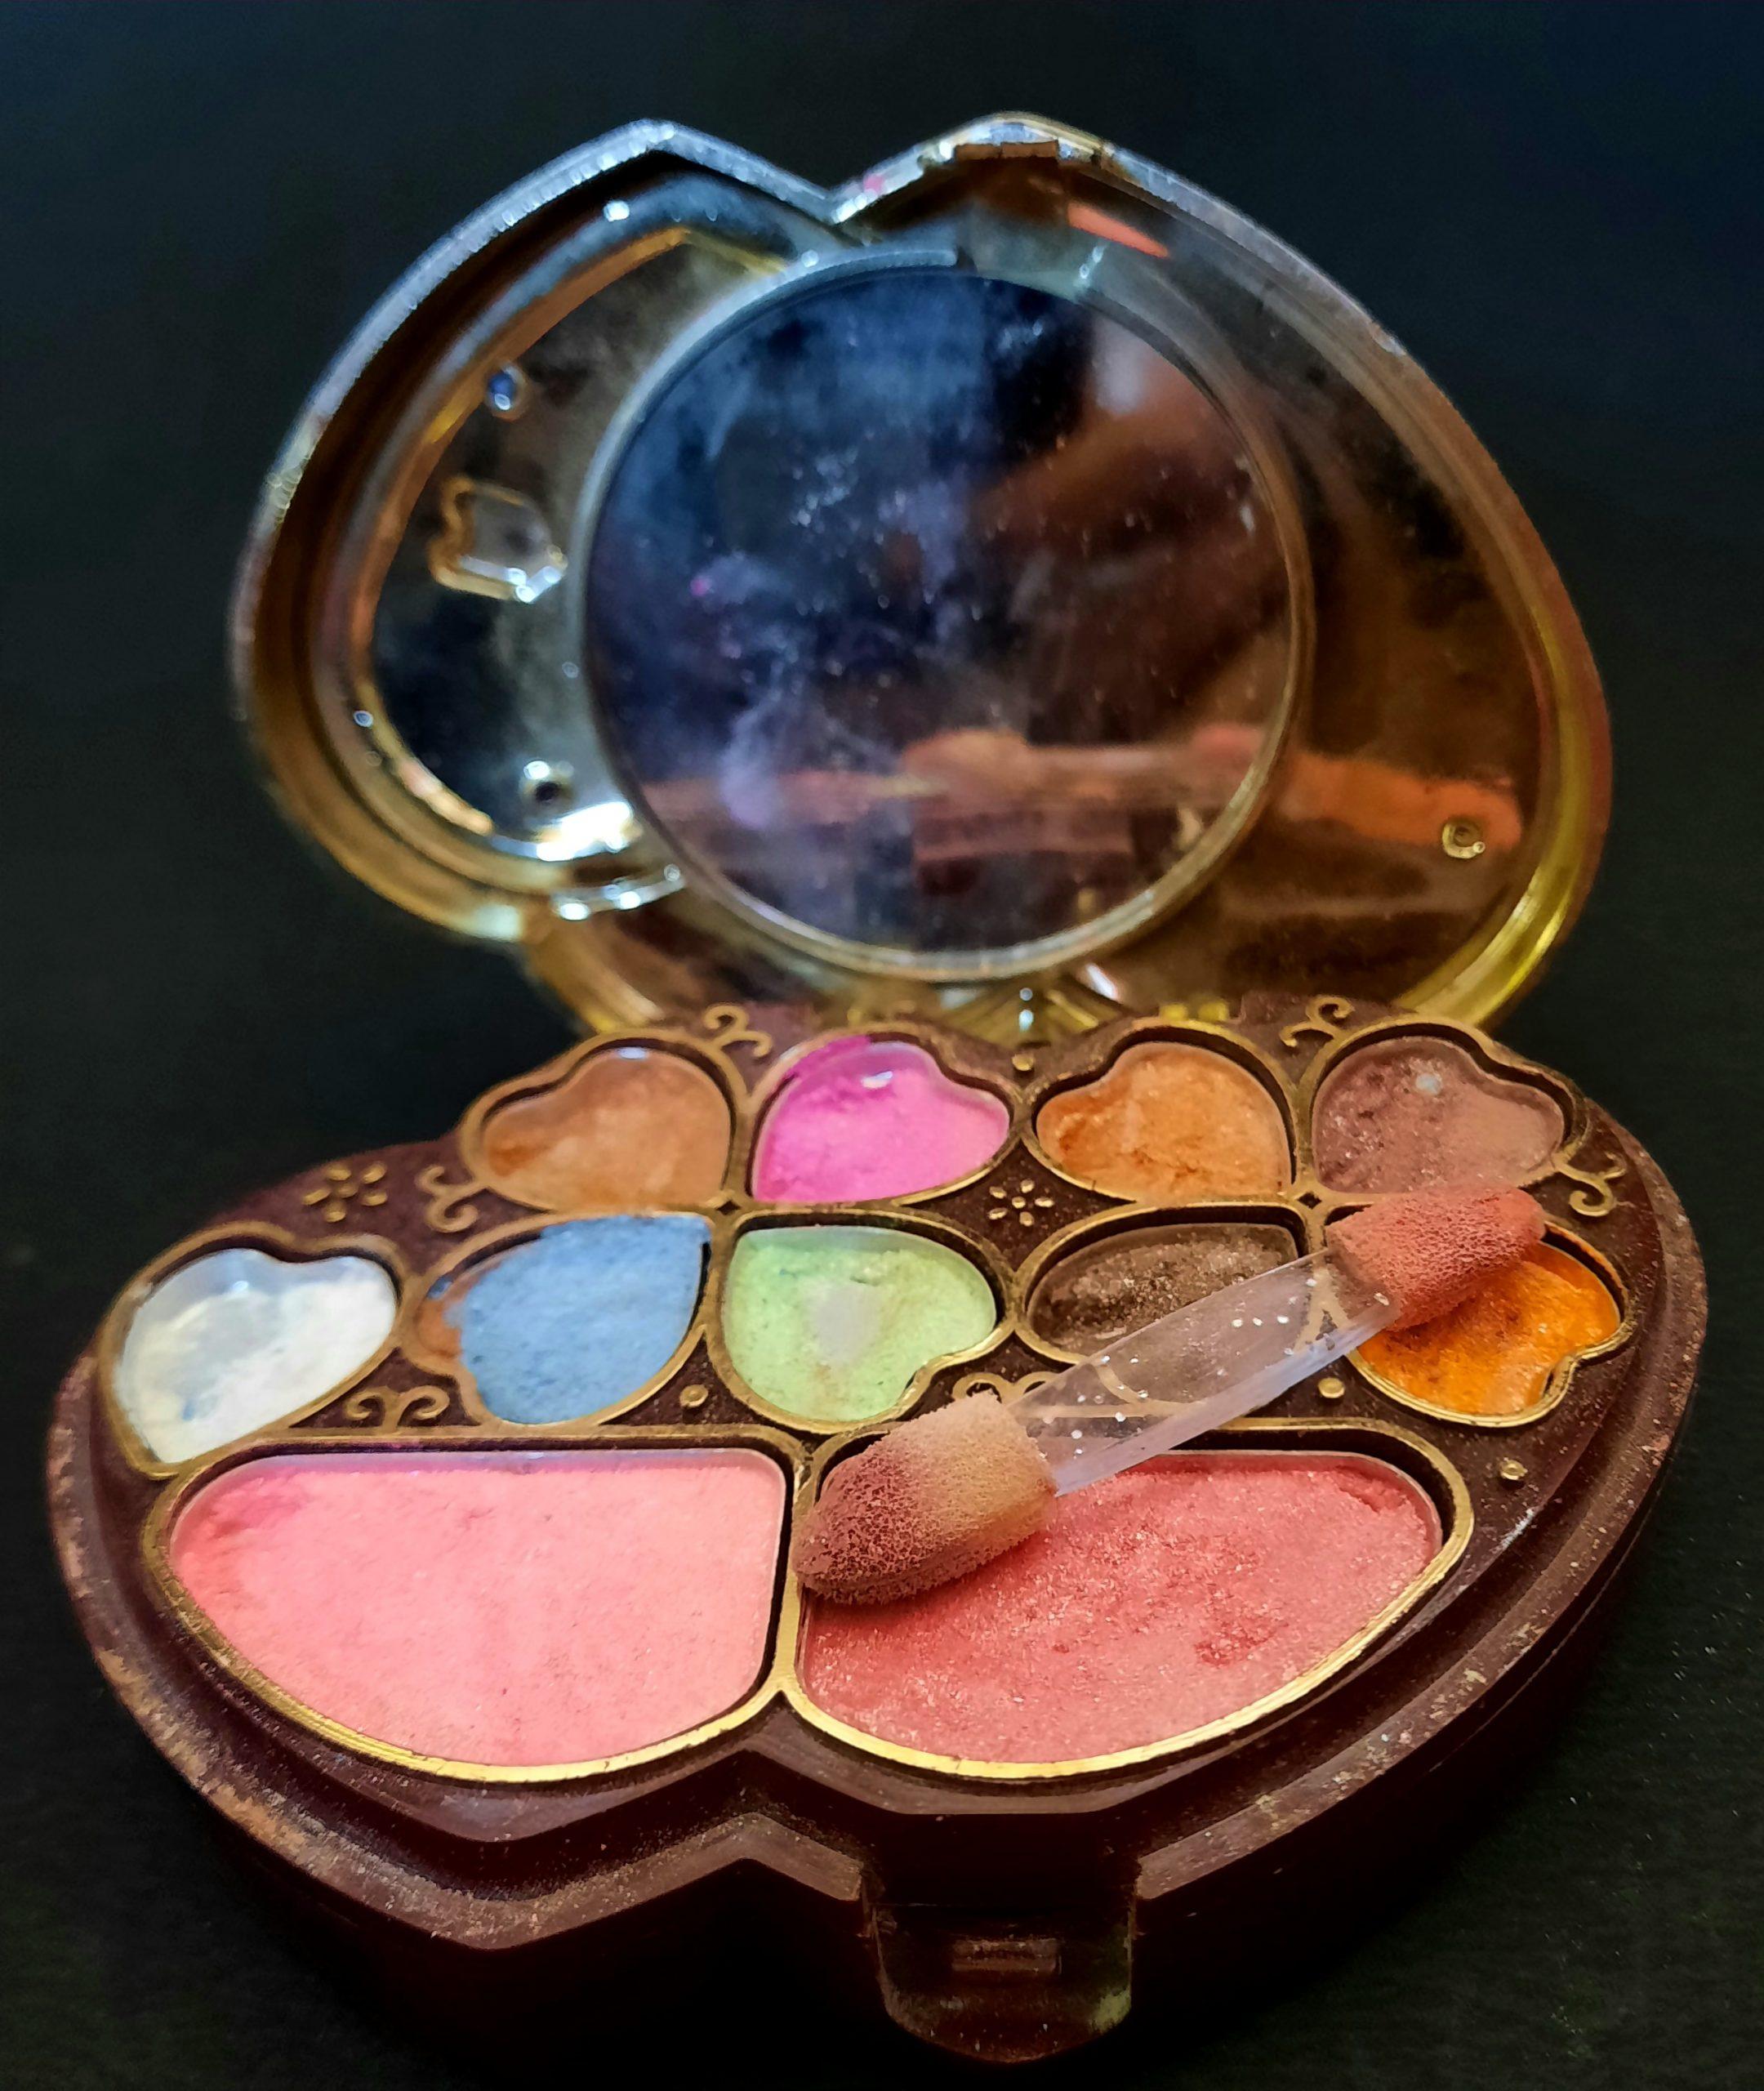 A colors makeup kit